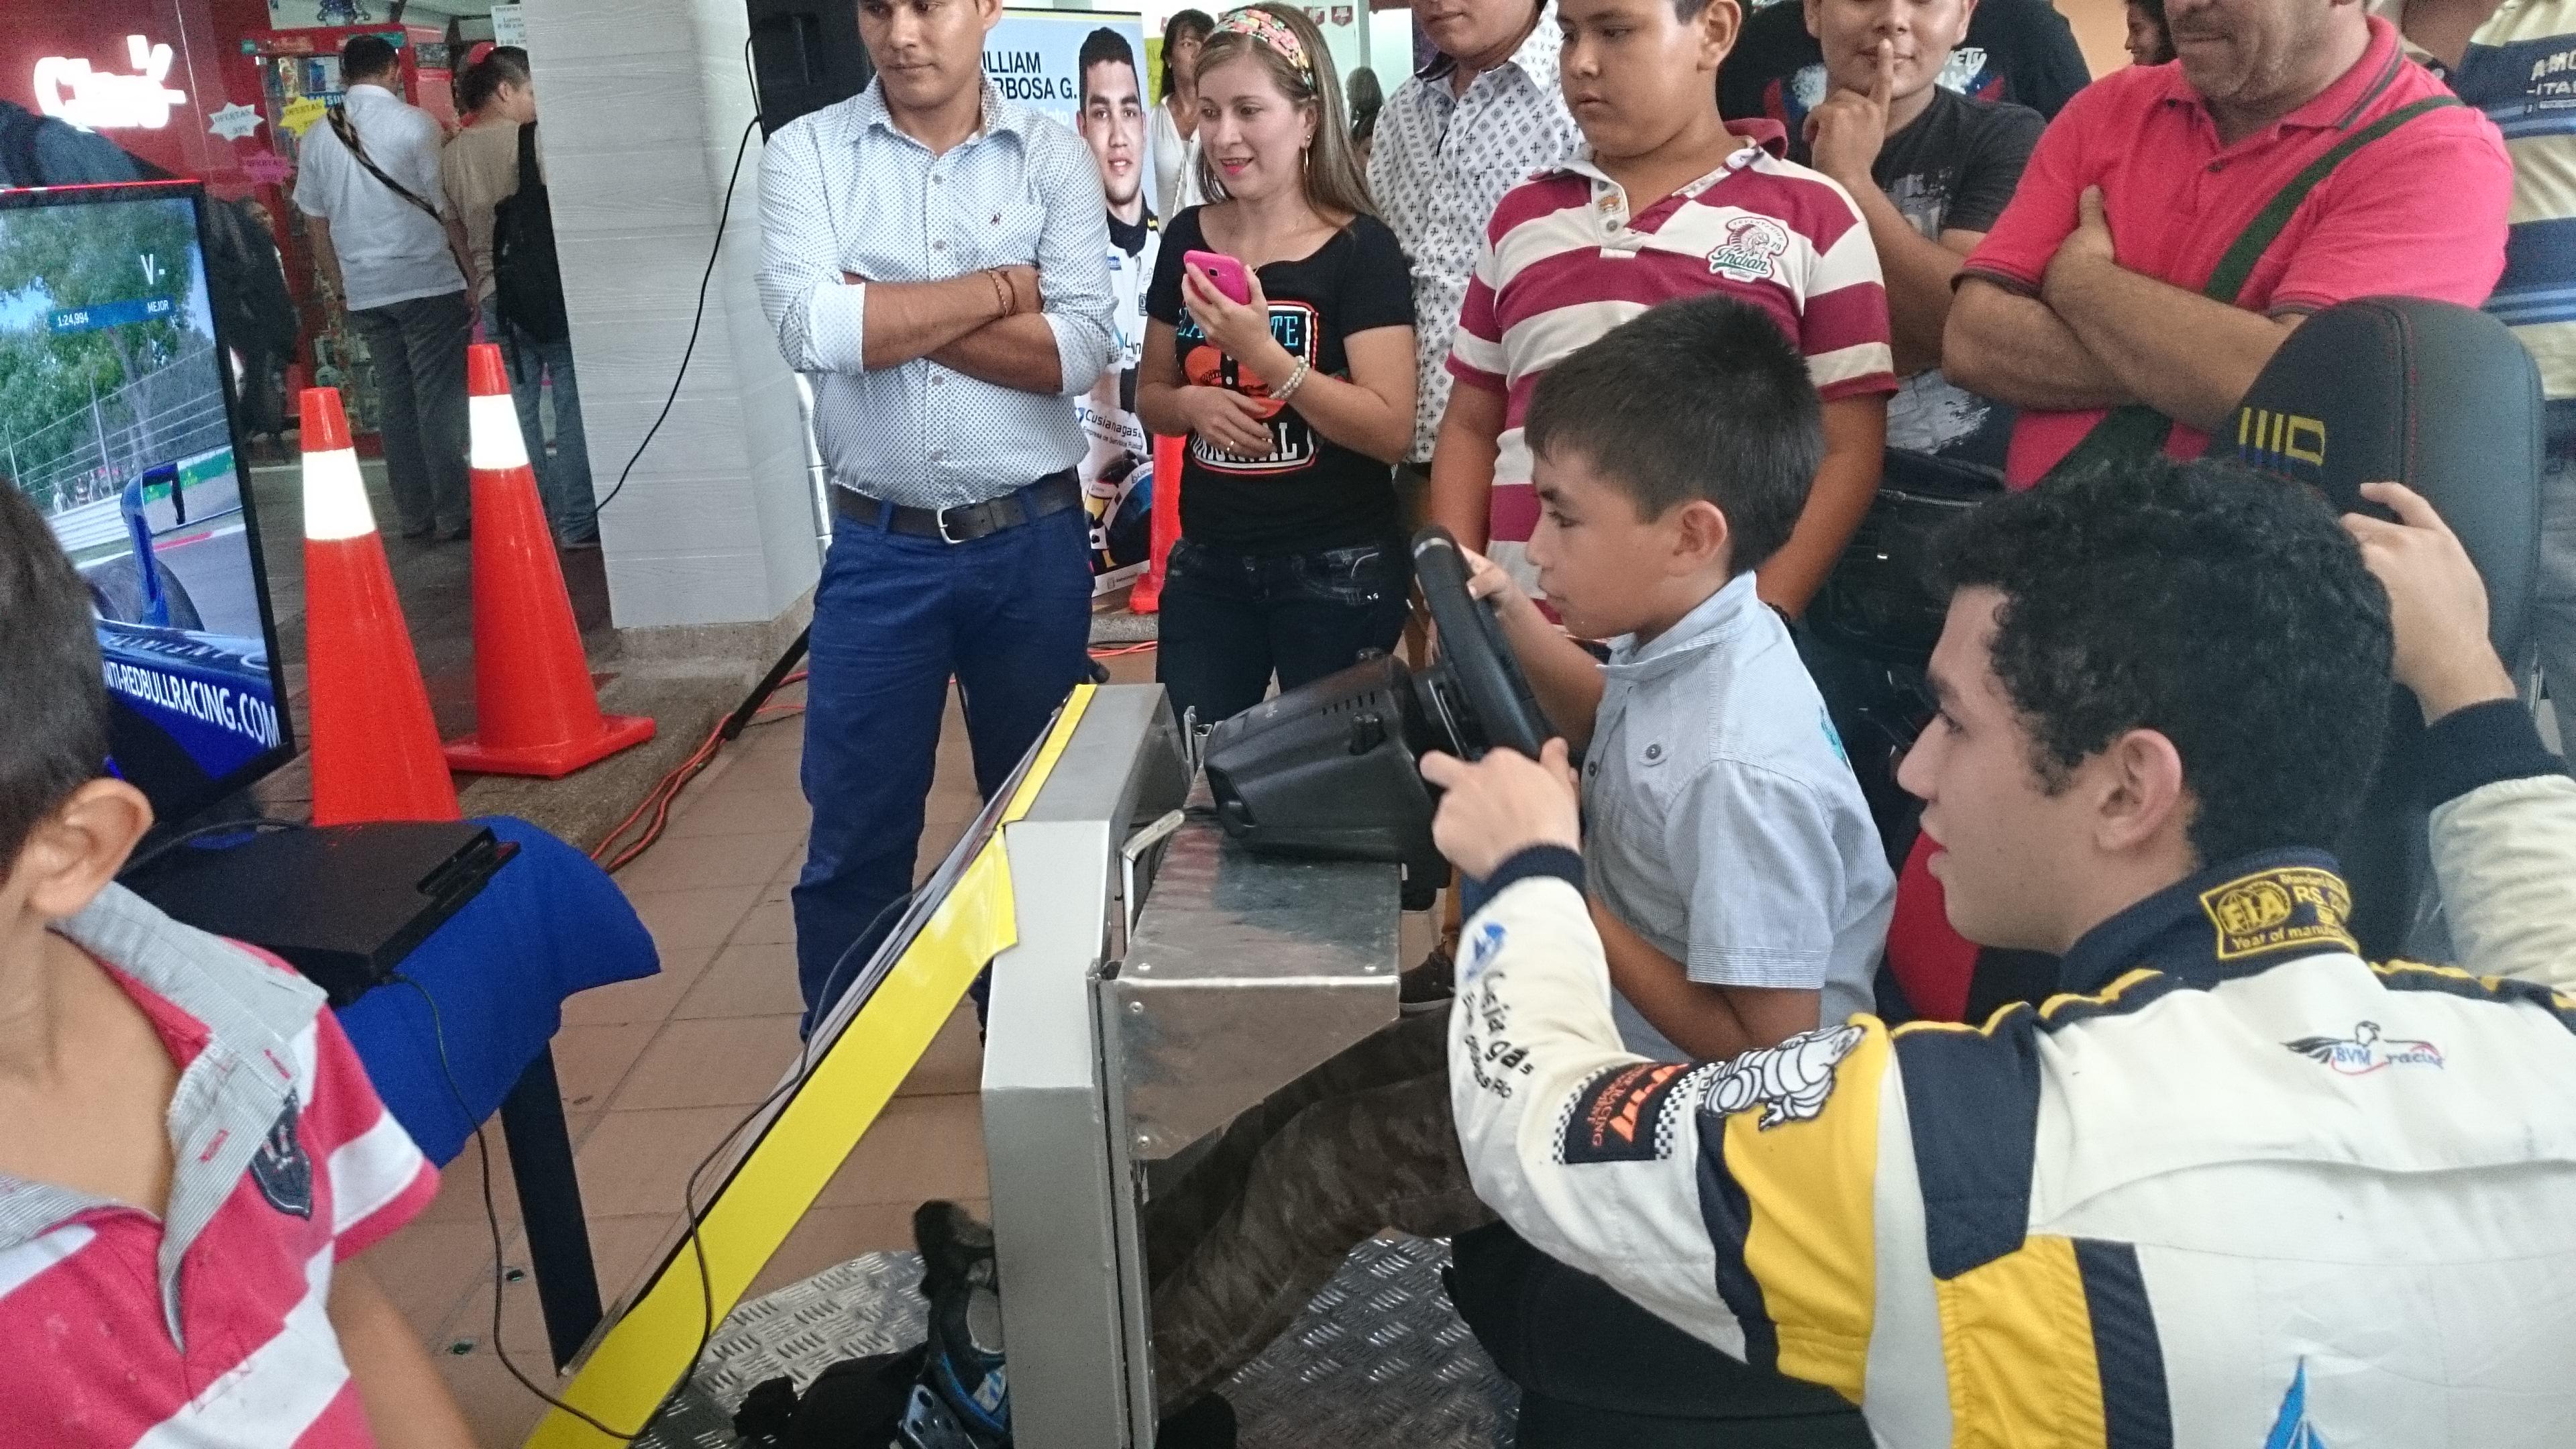 William Barbosa G. Centro Comercial Villacentro2717